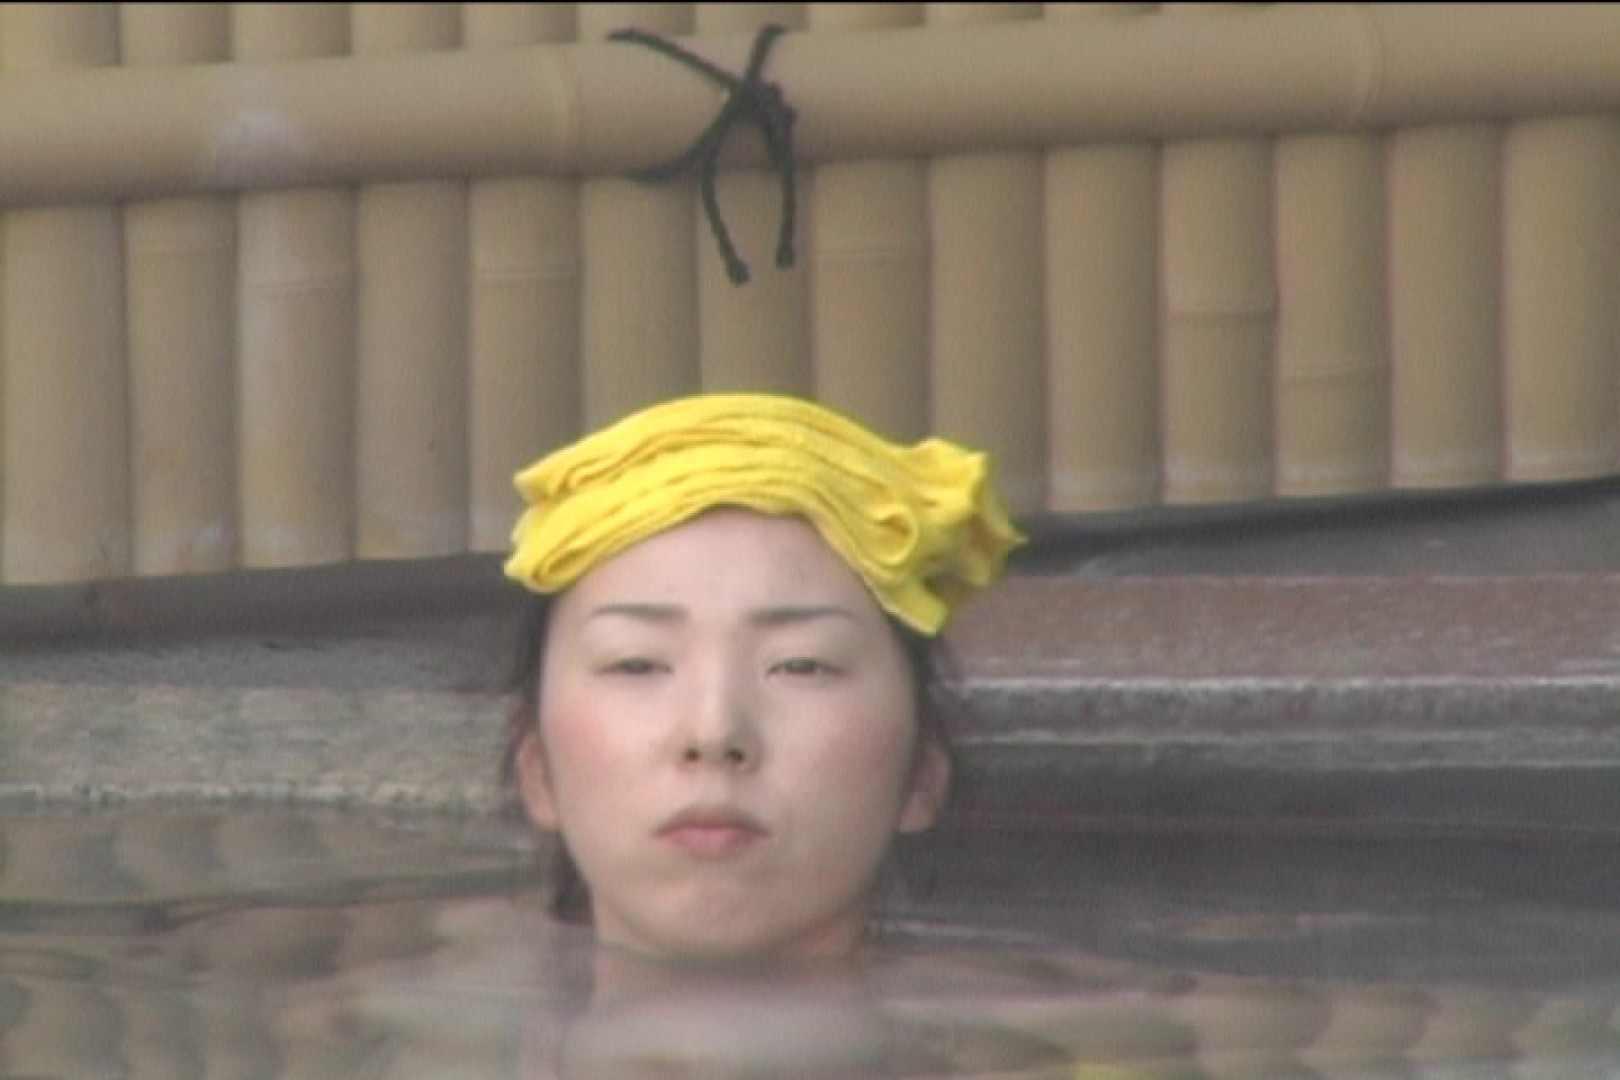 Aquaな露天風呂Vol.529 盗撮シリーズ | 露天風呂編  106PIX 11